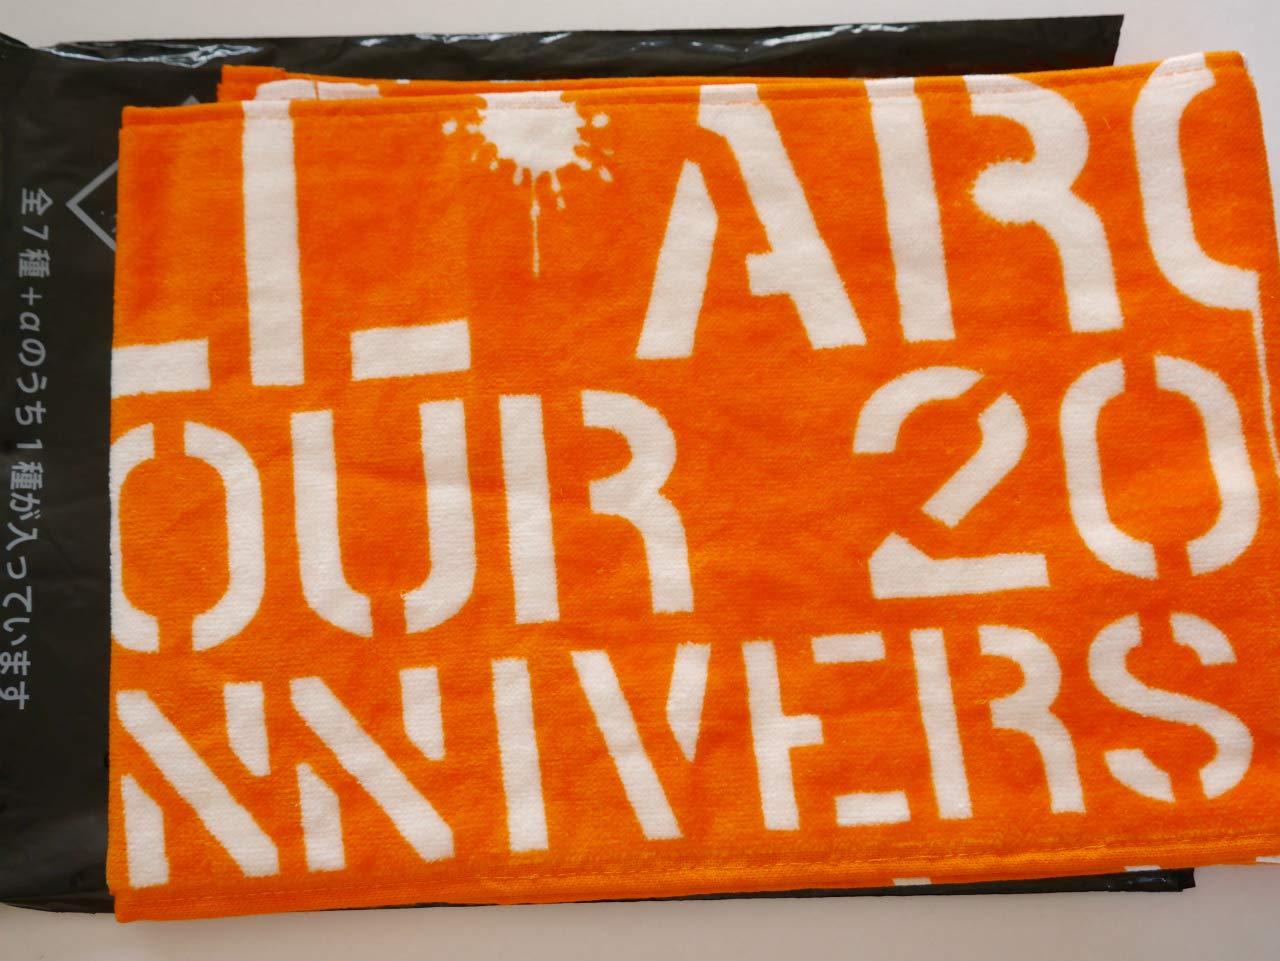 AAA   ATTACK ALL AROUND ARENA TOUR 2015  マフラータオル 西島隆弘 橙 オレンジ   B00X52O6LO